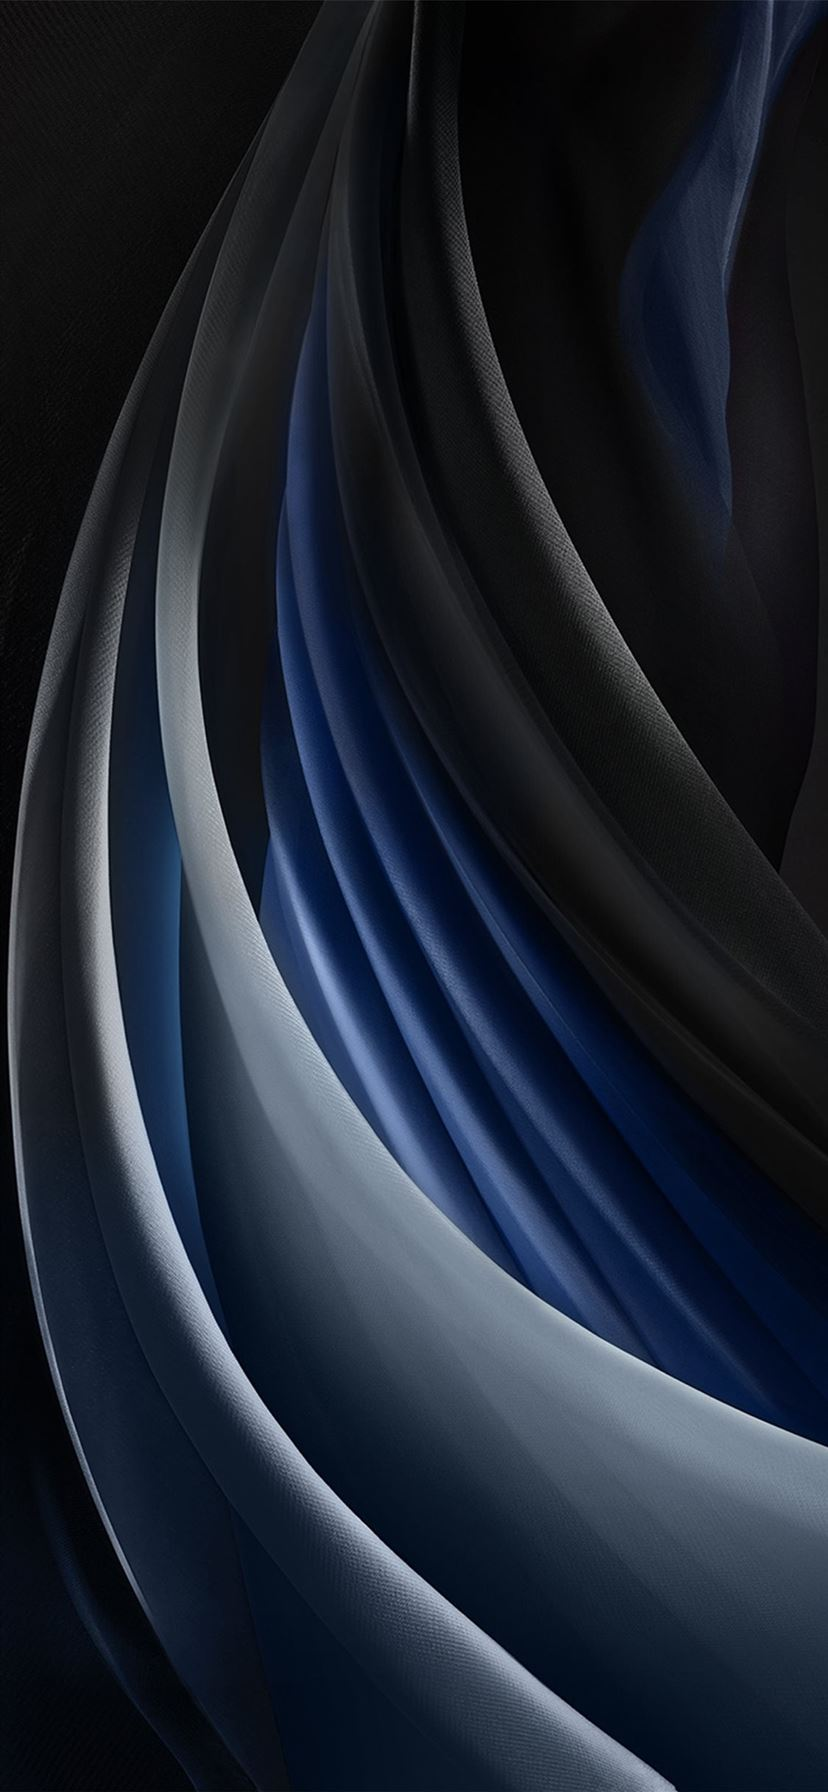 Iphone Se 2020 Stock Wallpaper Silk Space Grey Mono Dark Iphone 11 Wallpapers Free Download